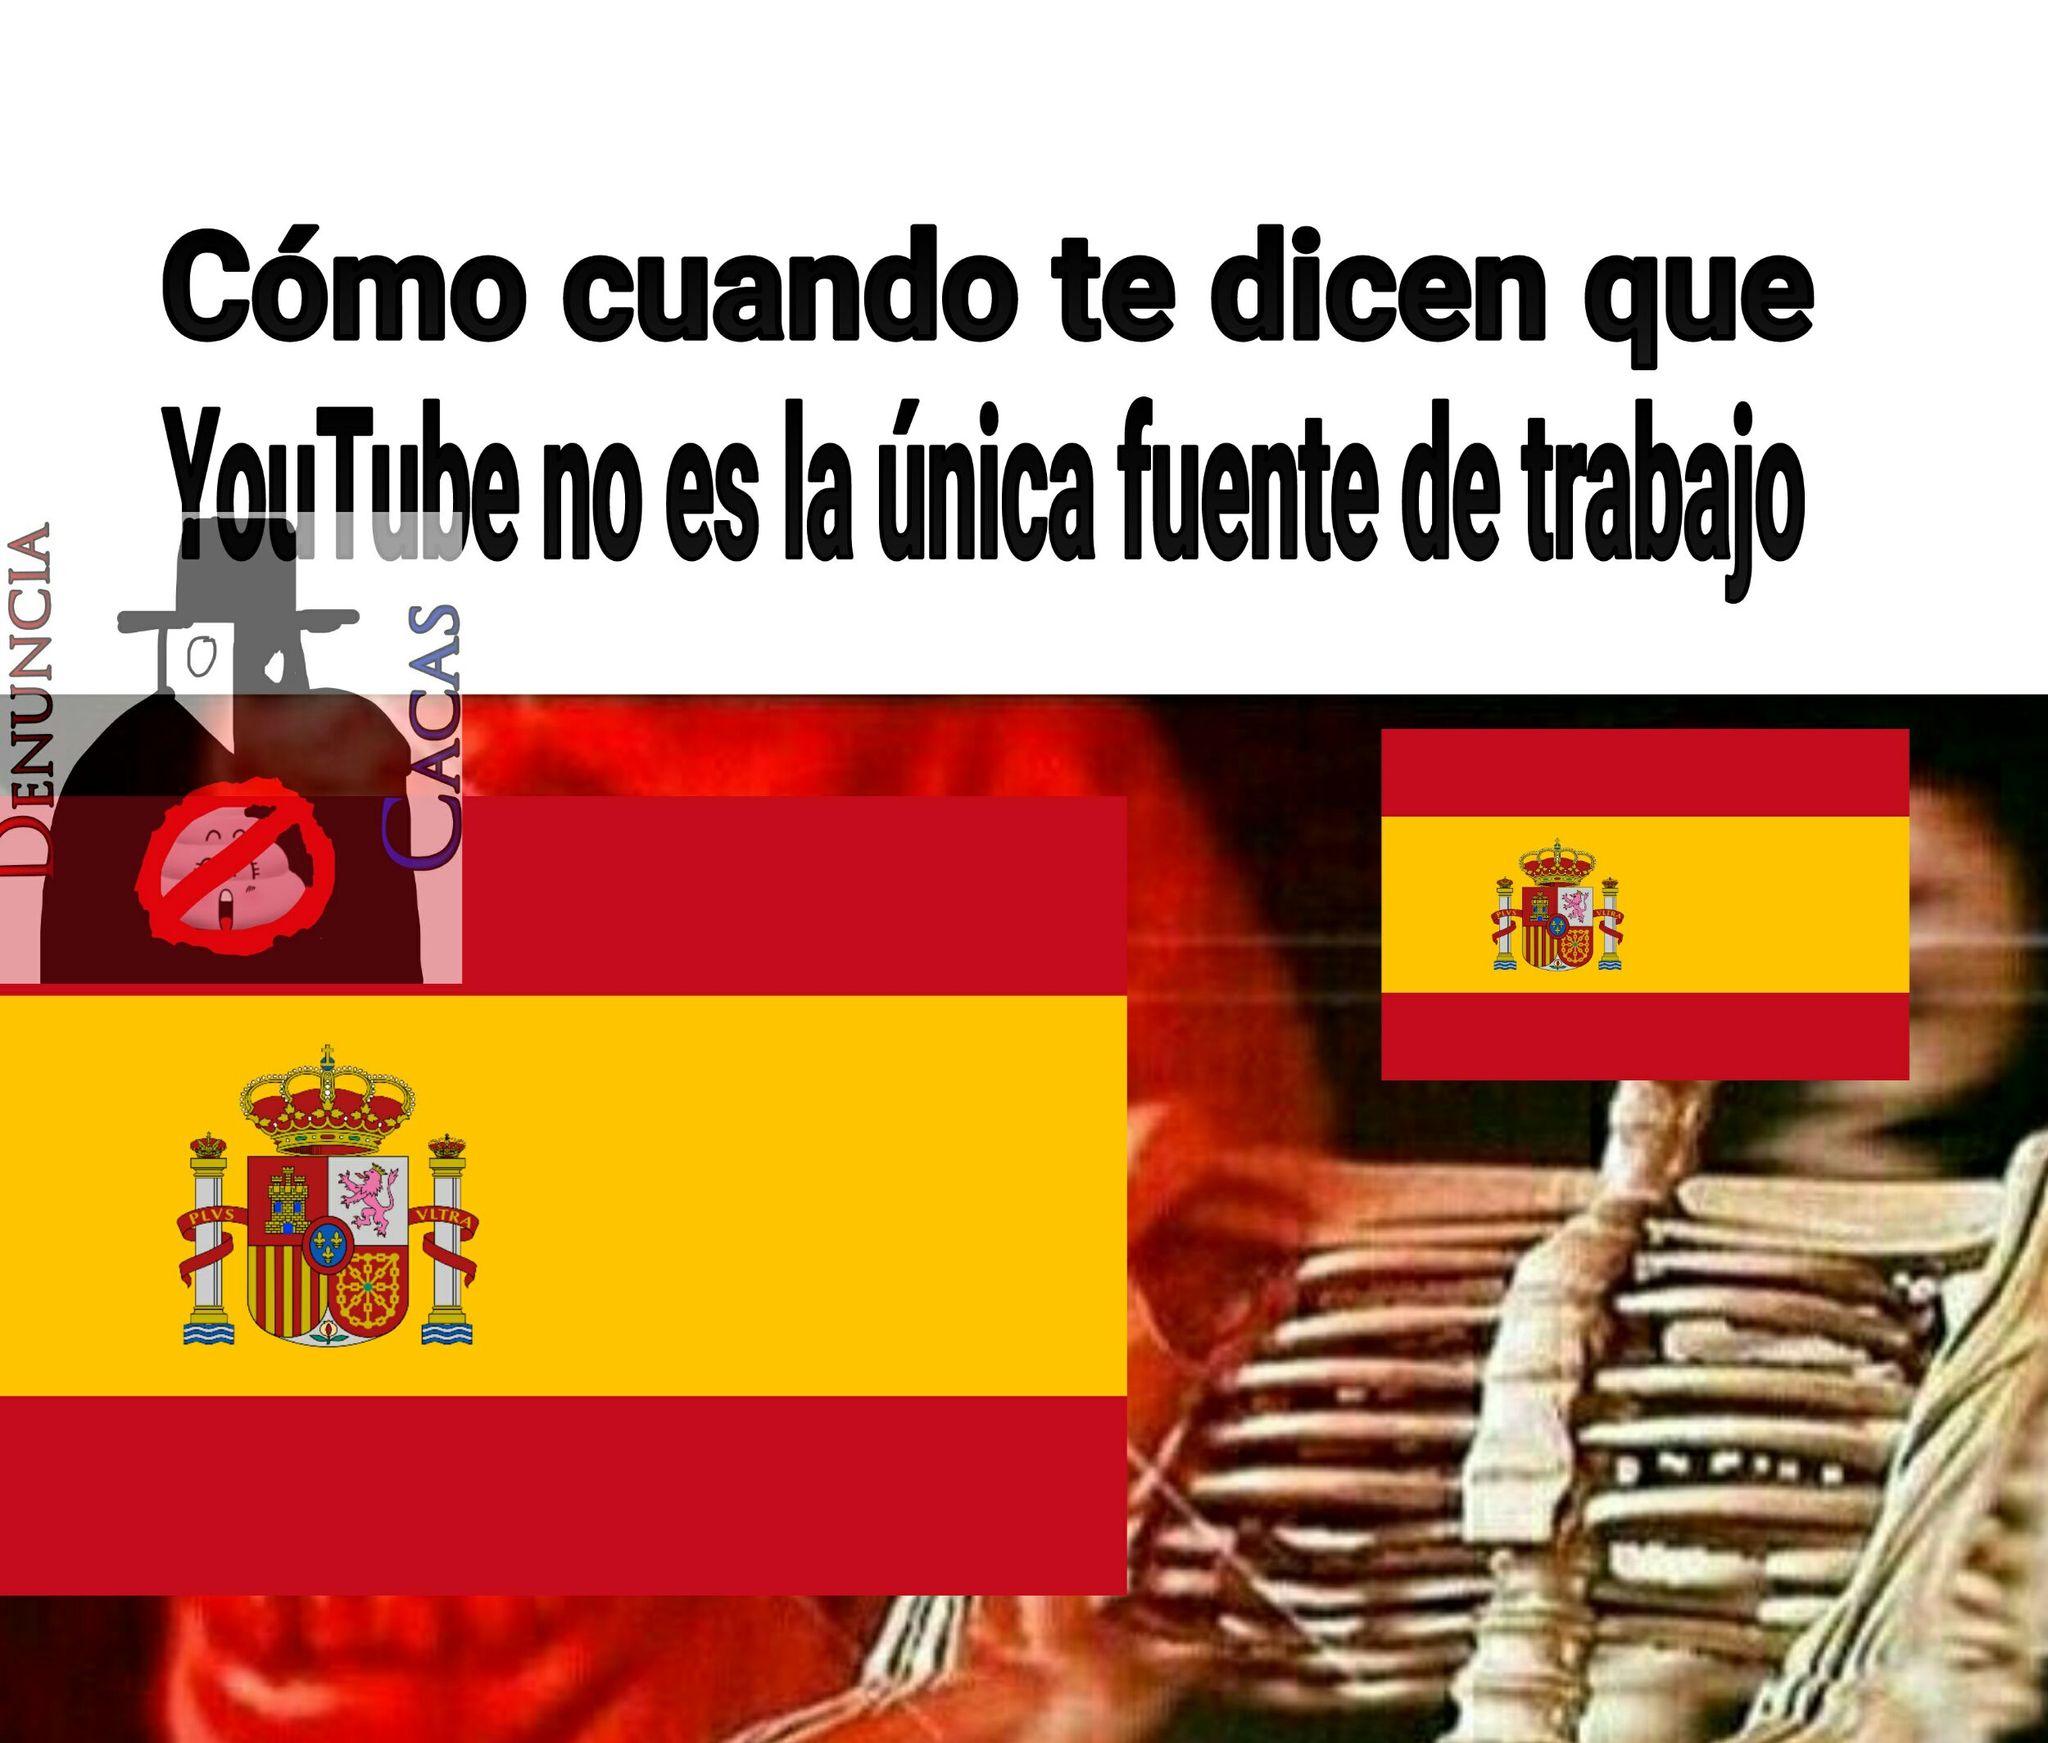 españolisiiimooo - meme